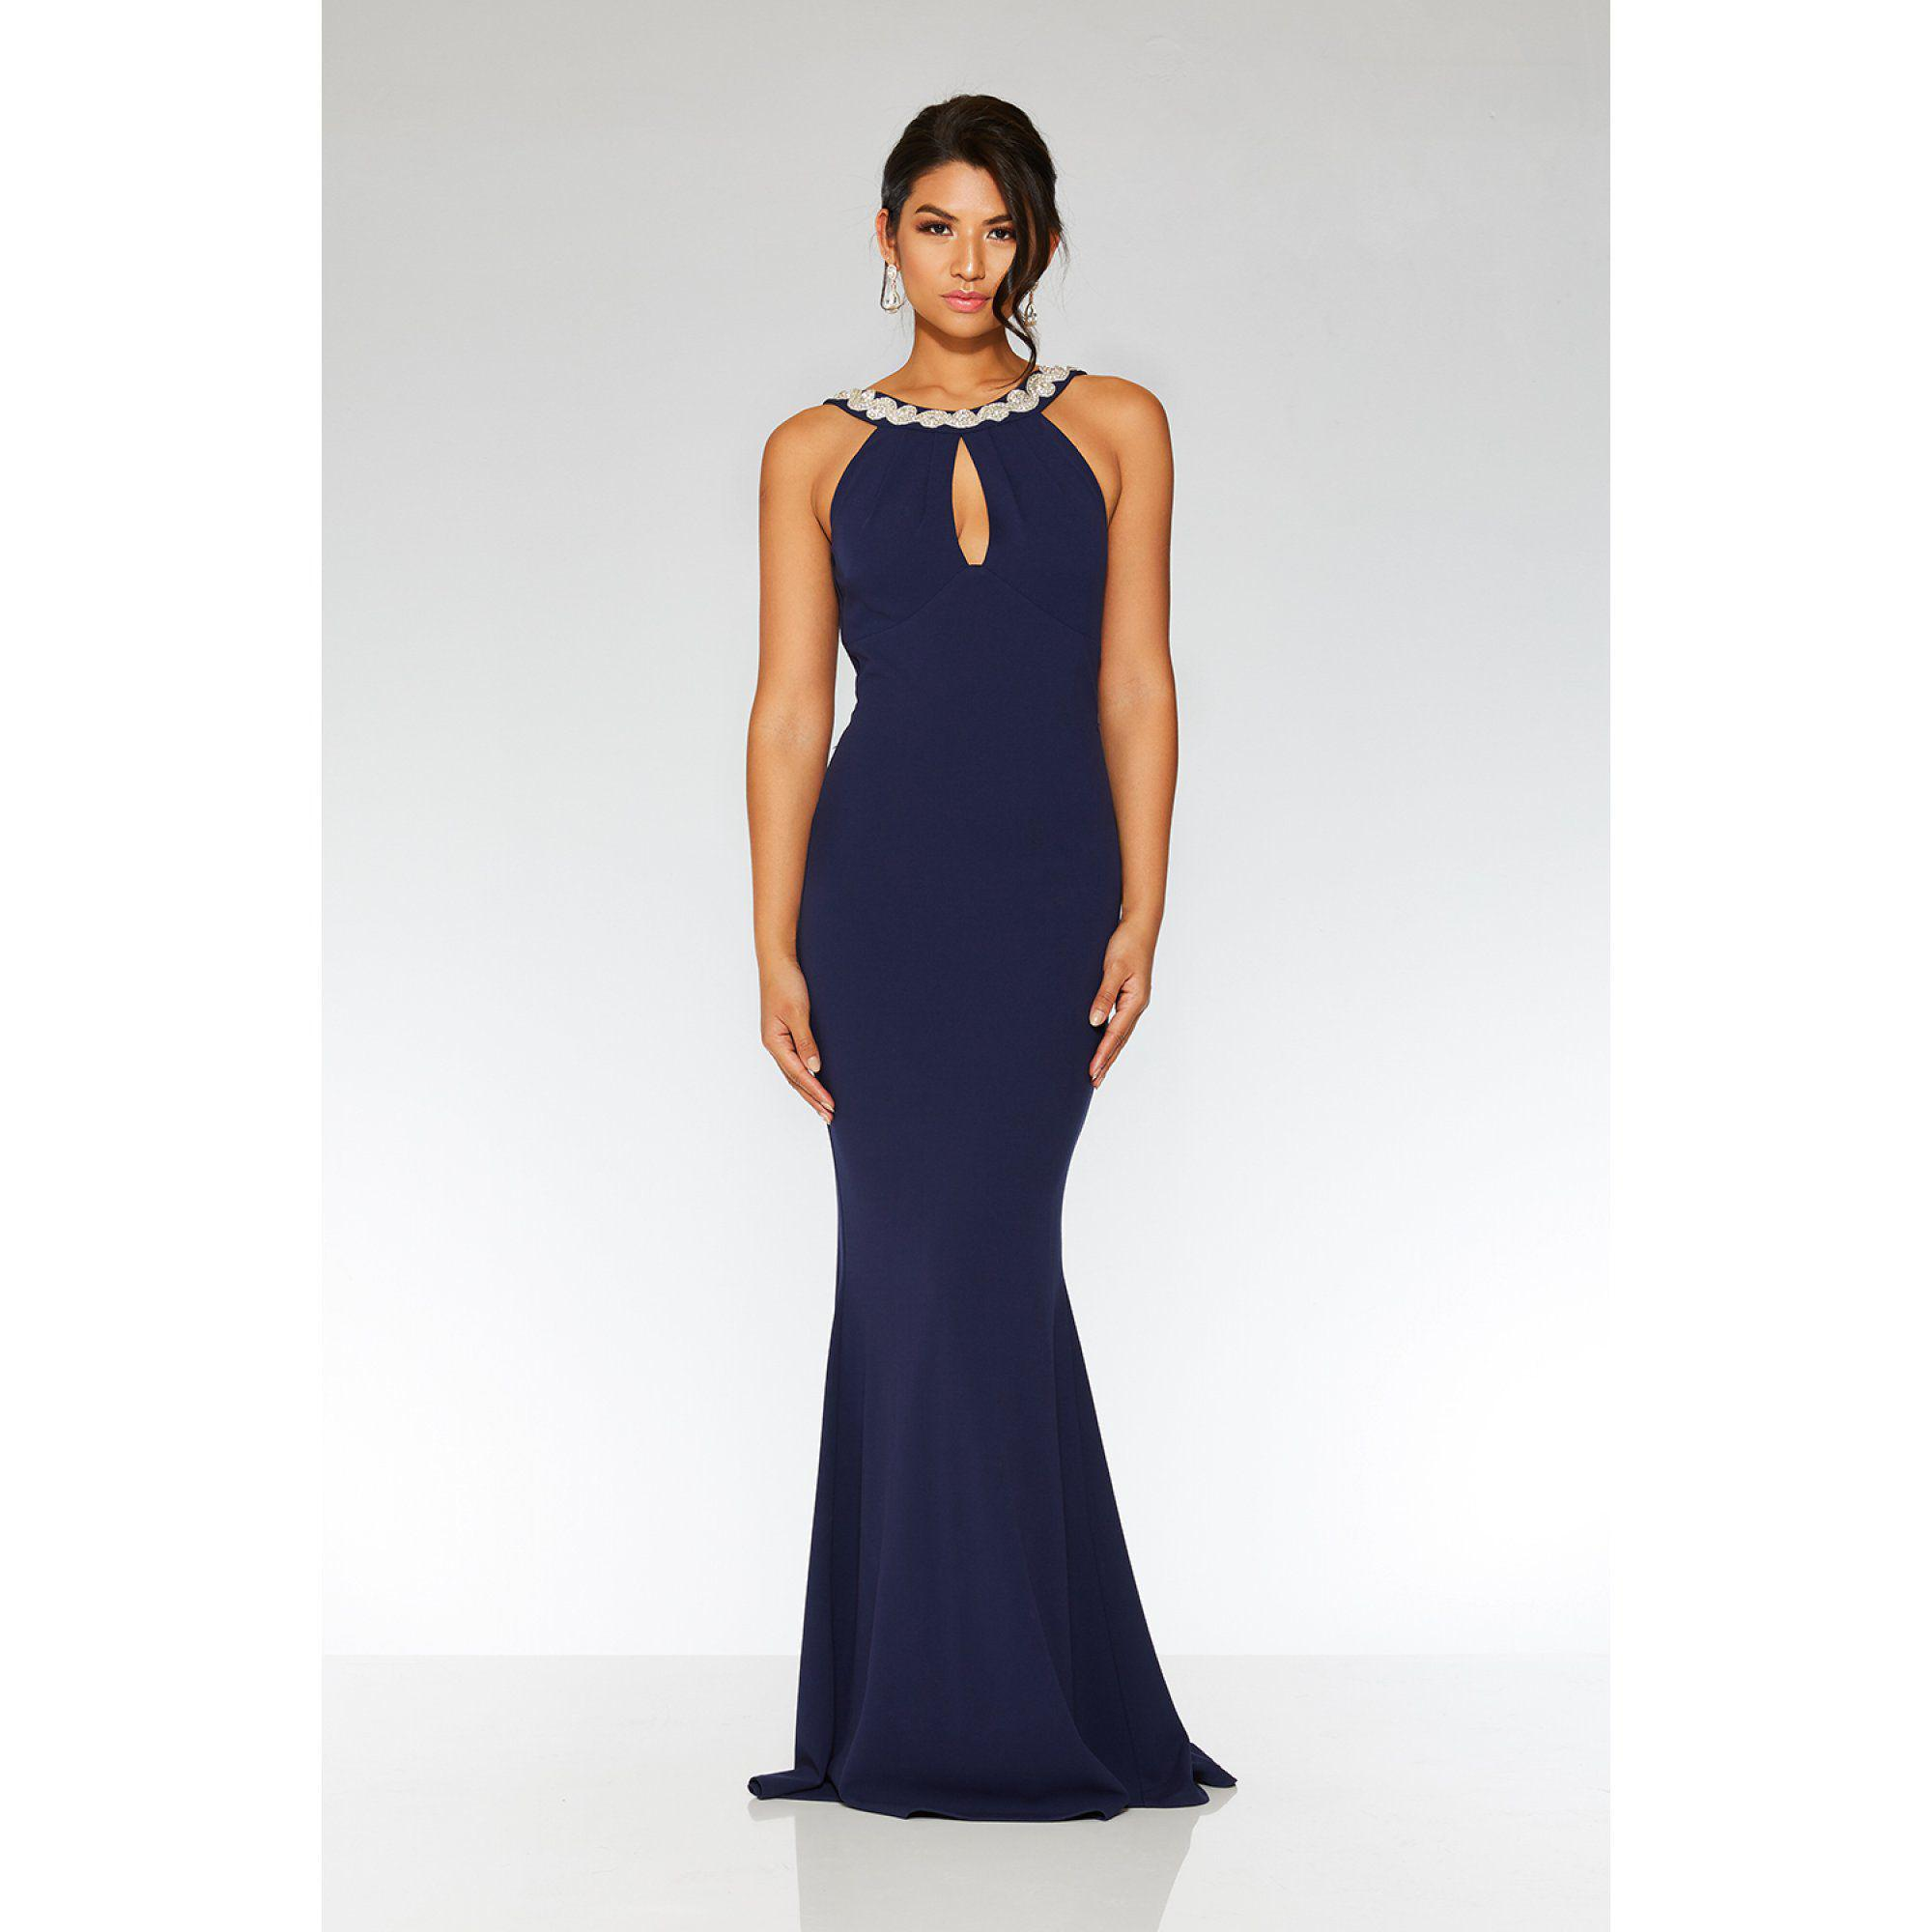 a6fac7a7239 boohoo Evening Dresses - ShopStyle